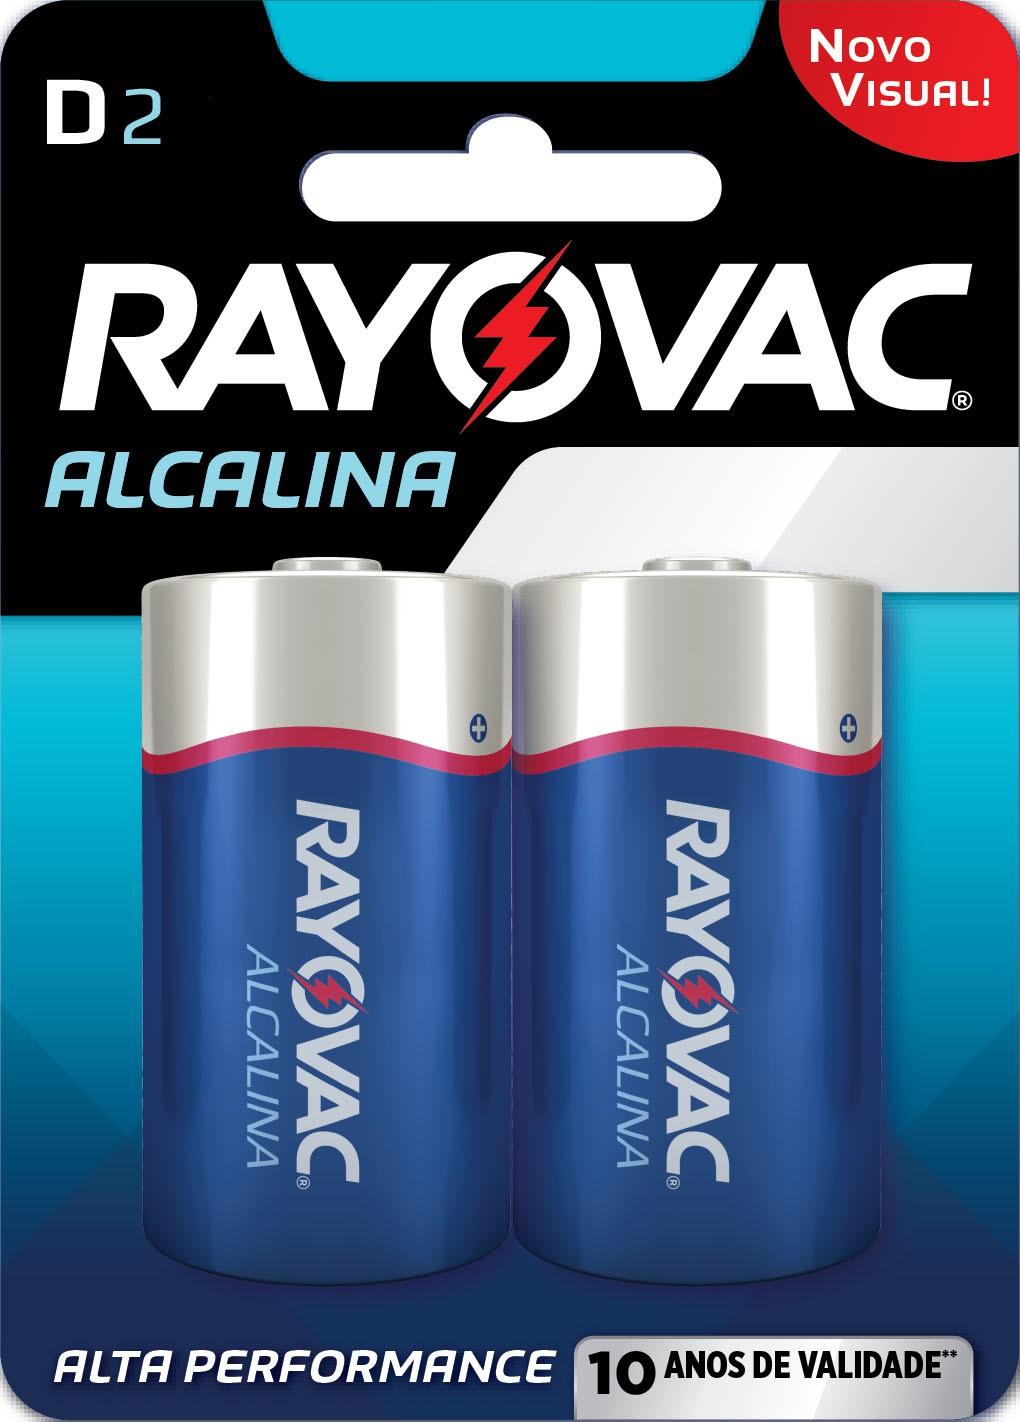 04 Pilhas D Grande LR20 Alcalina RAYOVAC 02 Cart c/ 2 unid